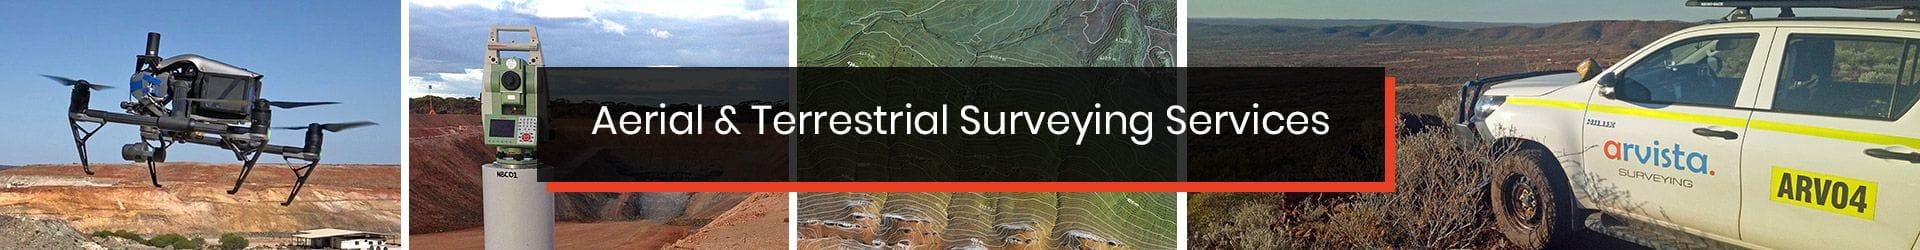 Arvista Aerial & Terrestrial Surveying Services